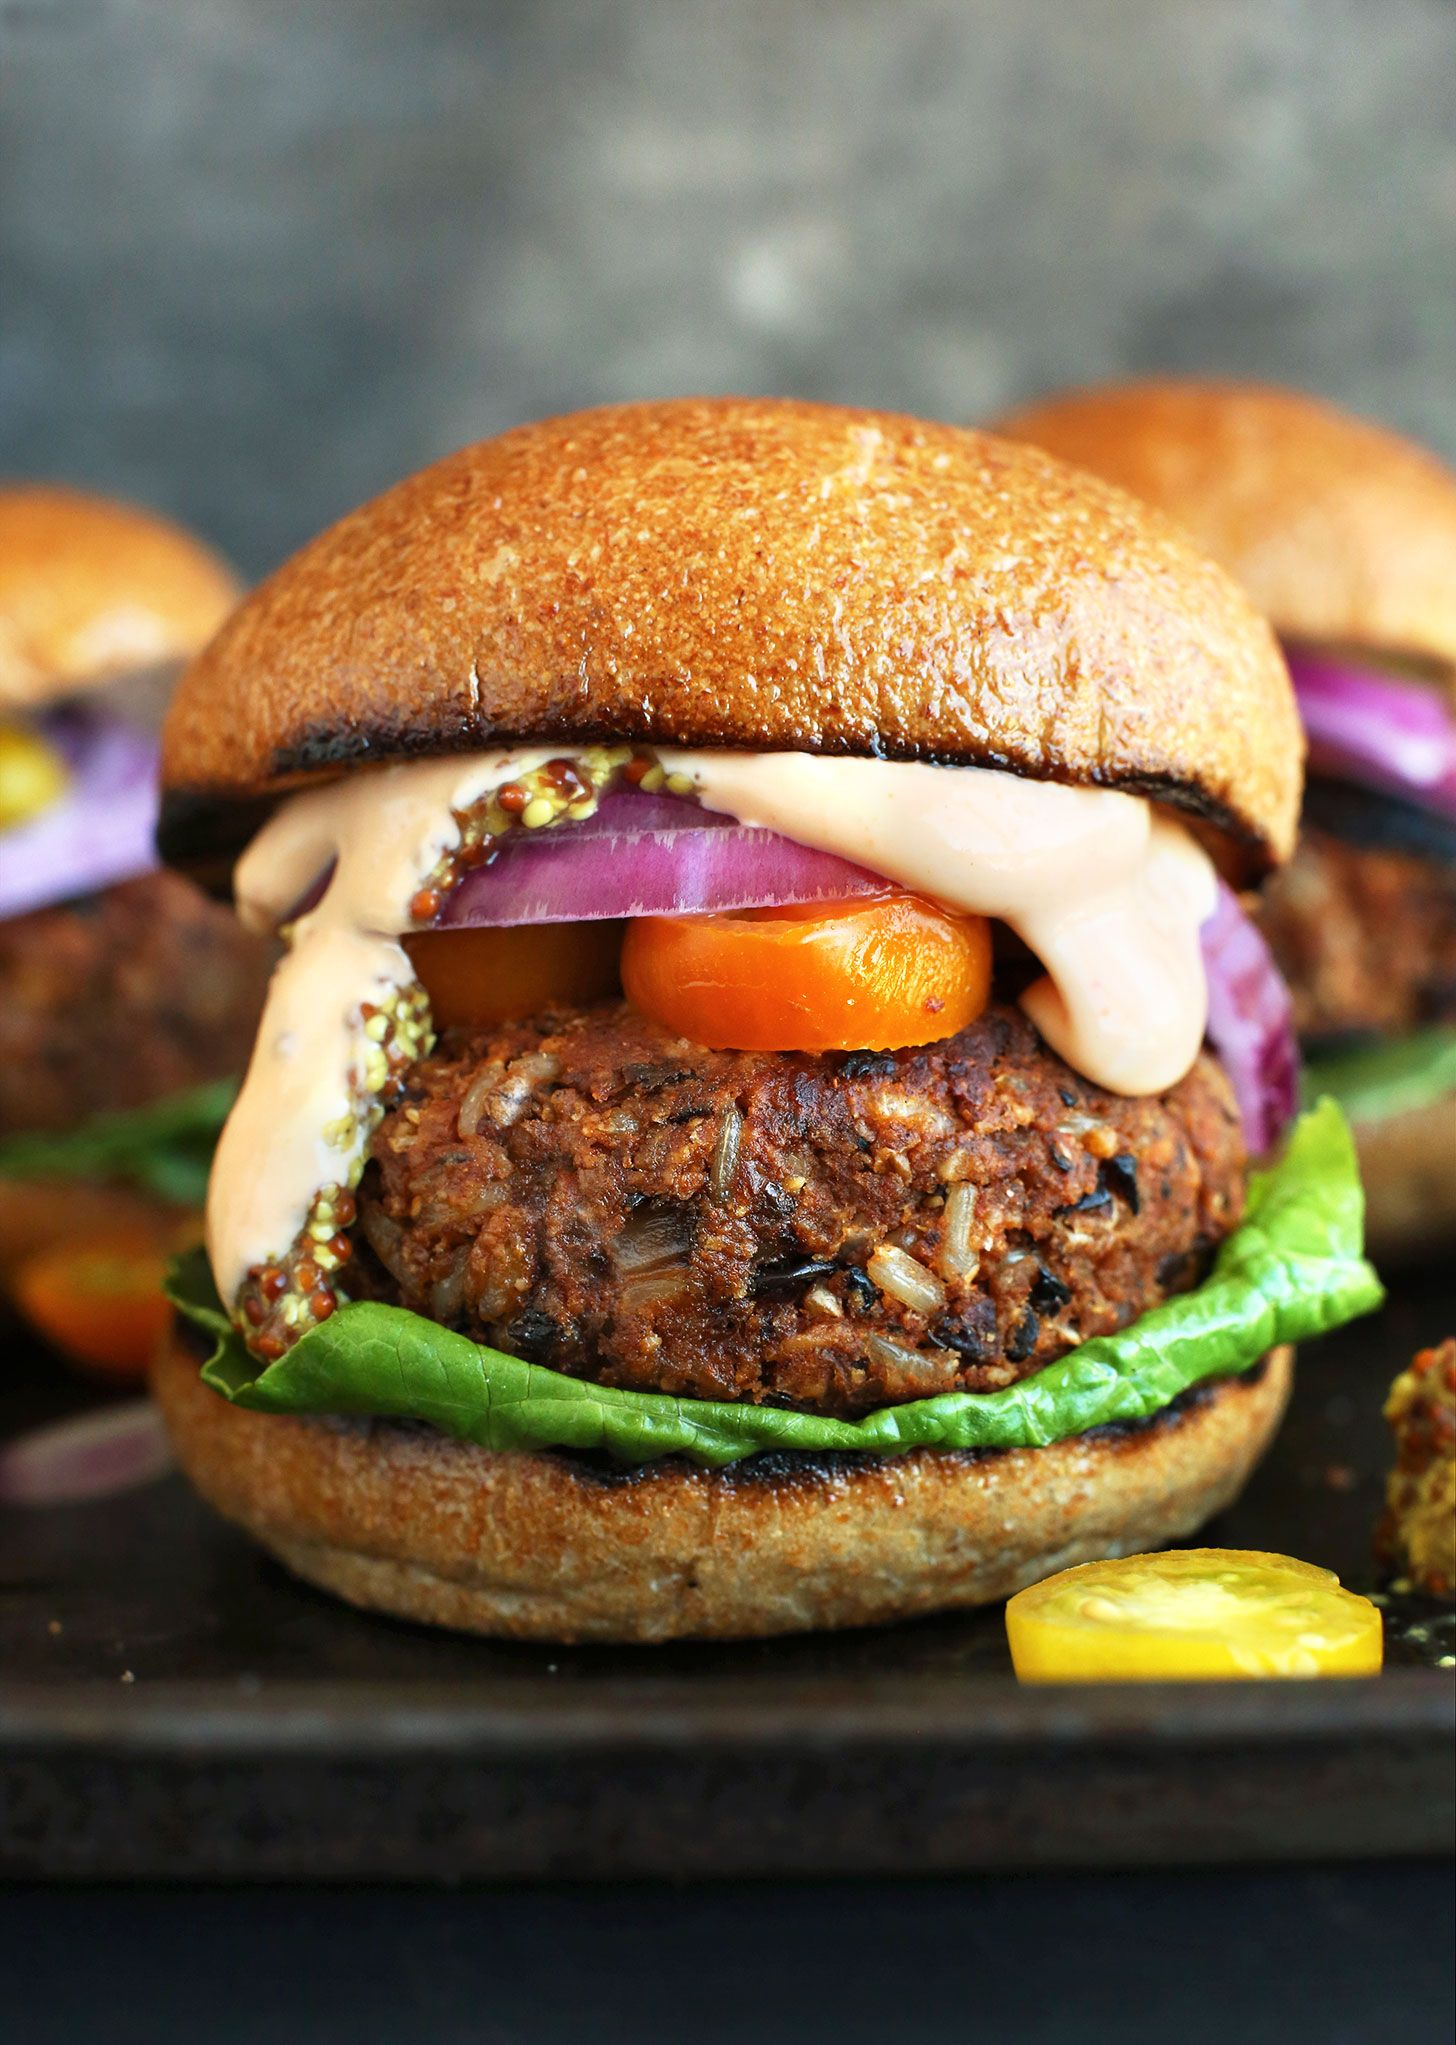 Grillable Veggie Burger Minimalist Baker Recipes Recipe Vegetarian Bbq Vegan Burger Recipe Grillable Veggie Burger